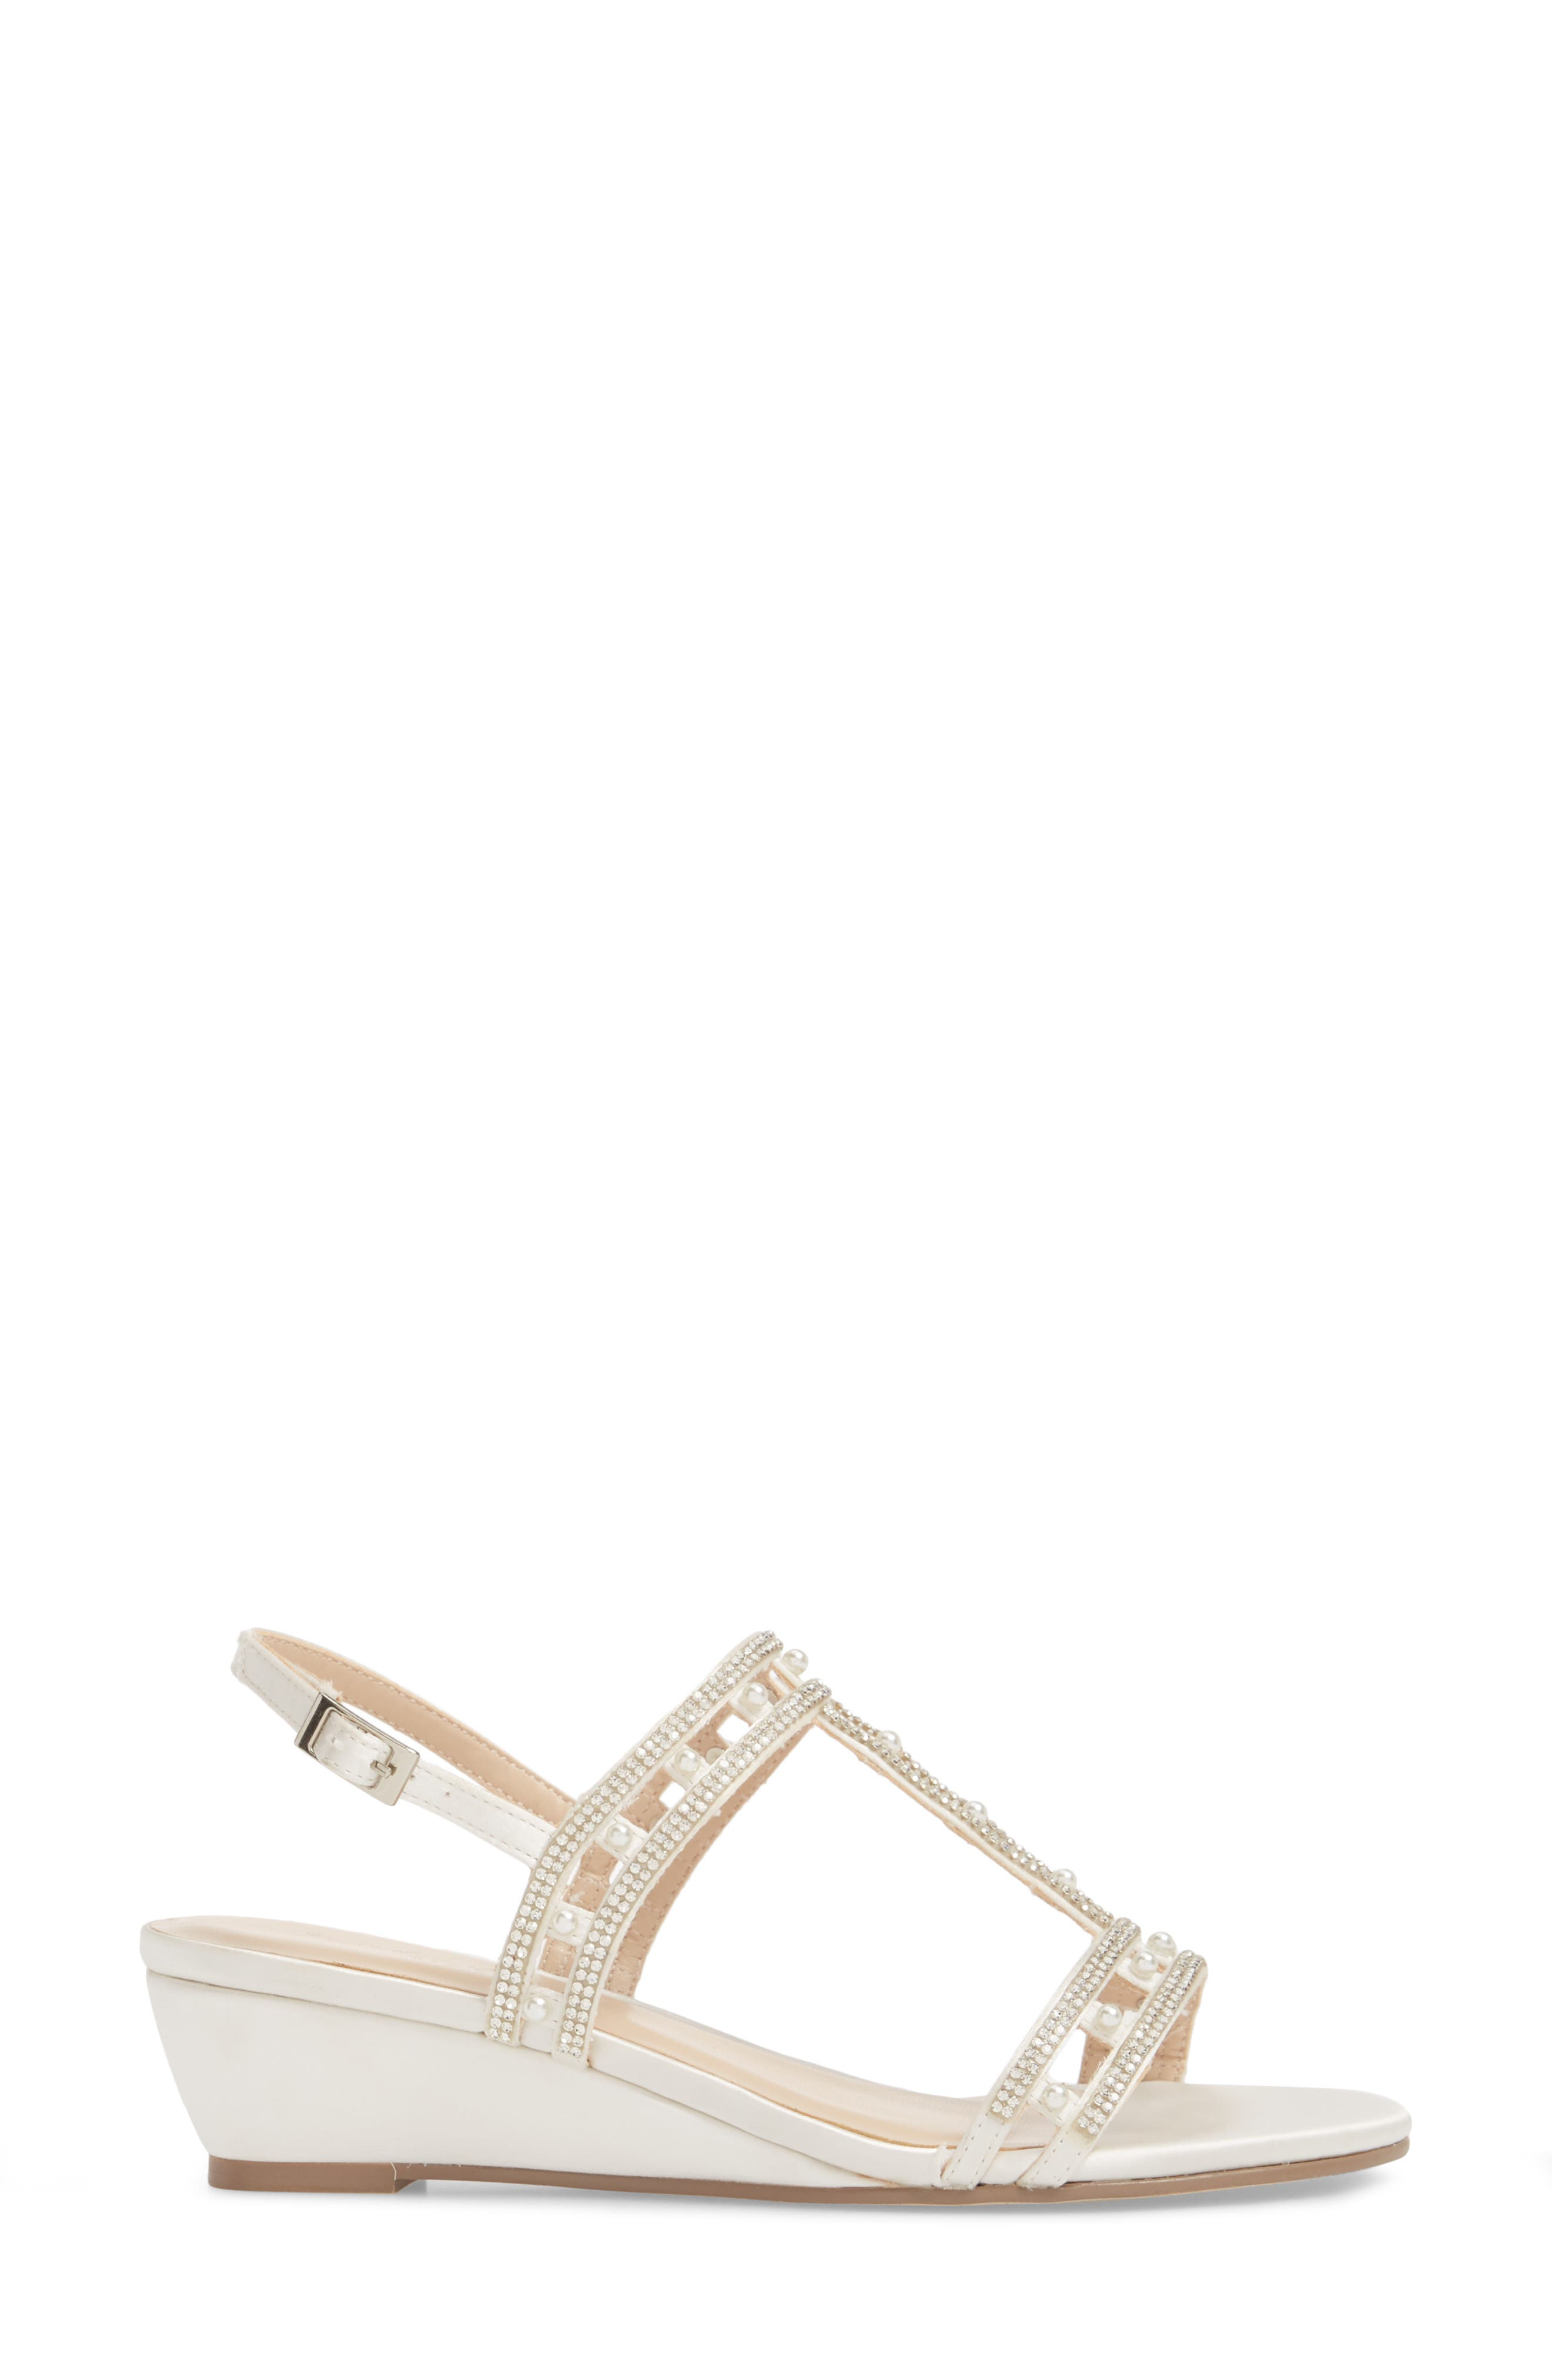 Kamara Embellished Wedge Sandal,                             Alternate thumbnail 3, color,                             Ivory Satin